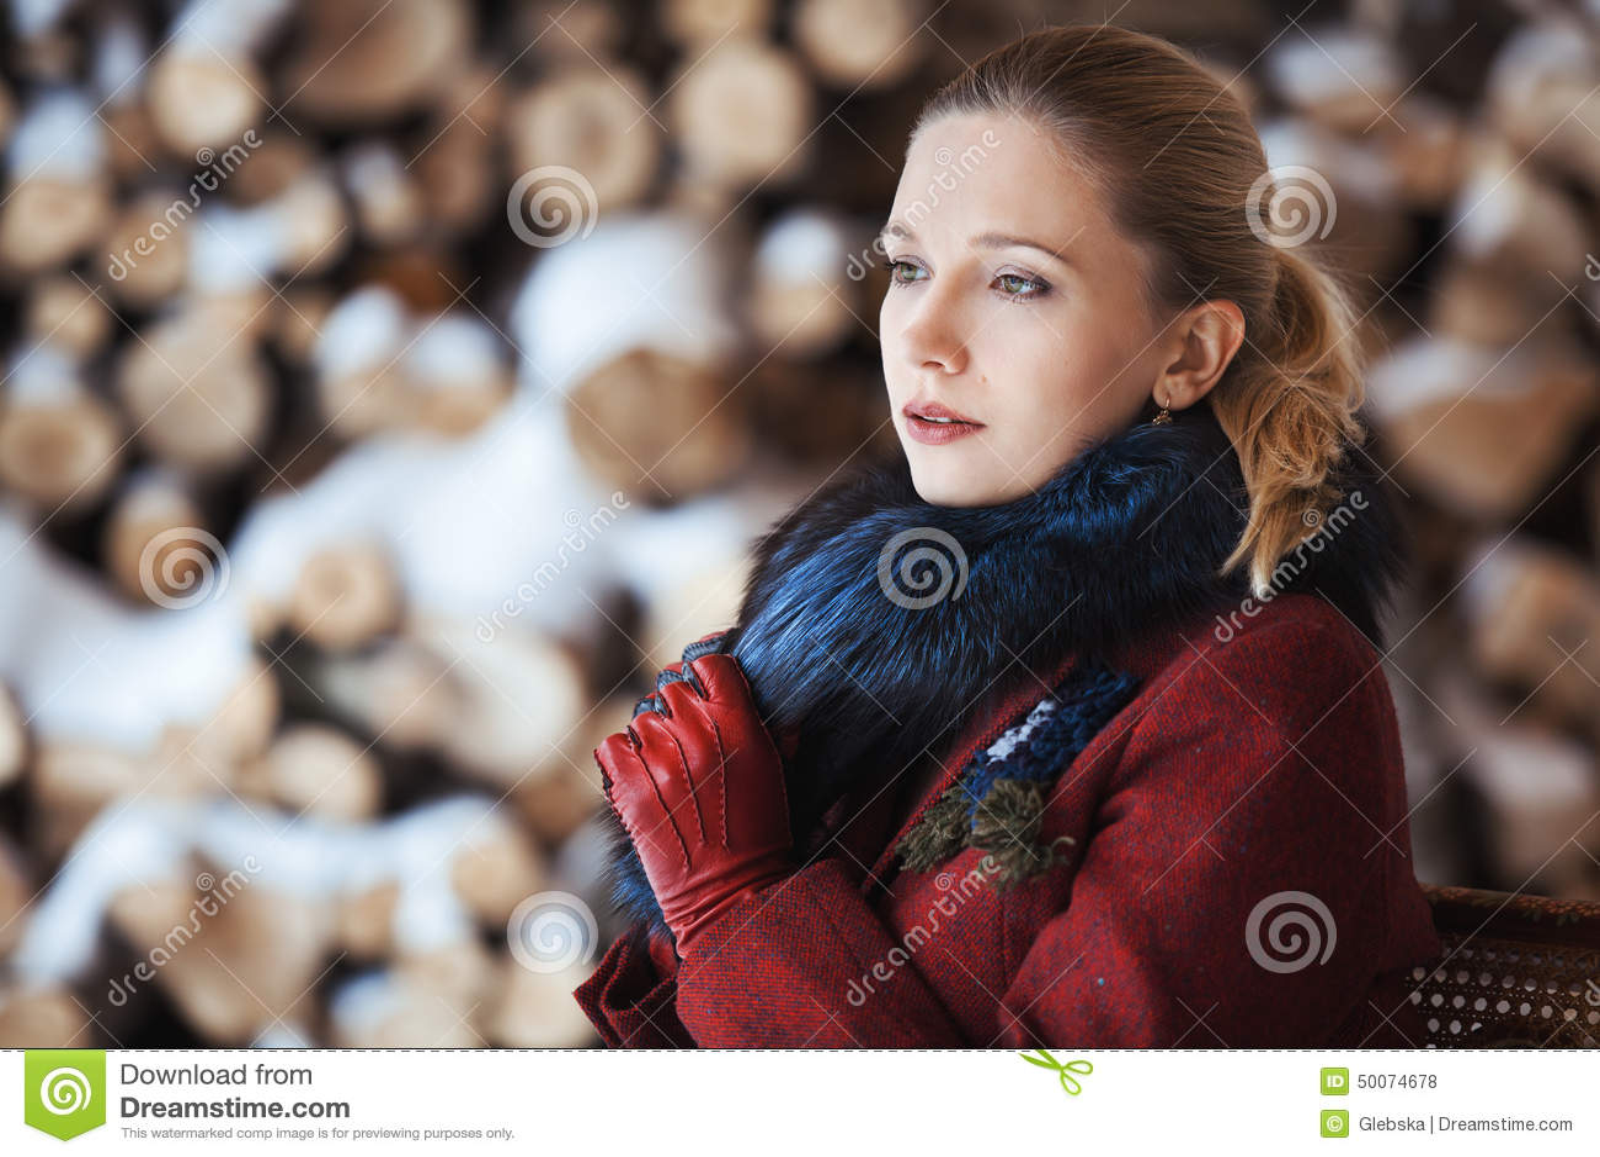 Winter portrait of blonde woman on firewood background